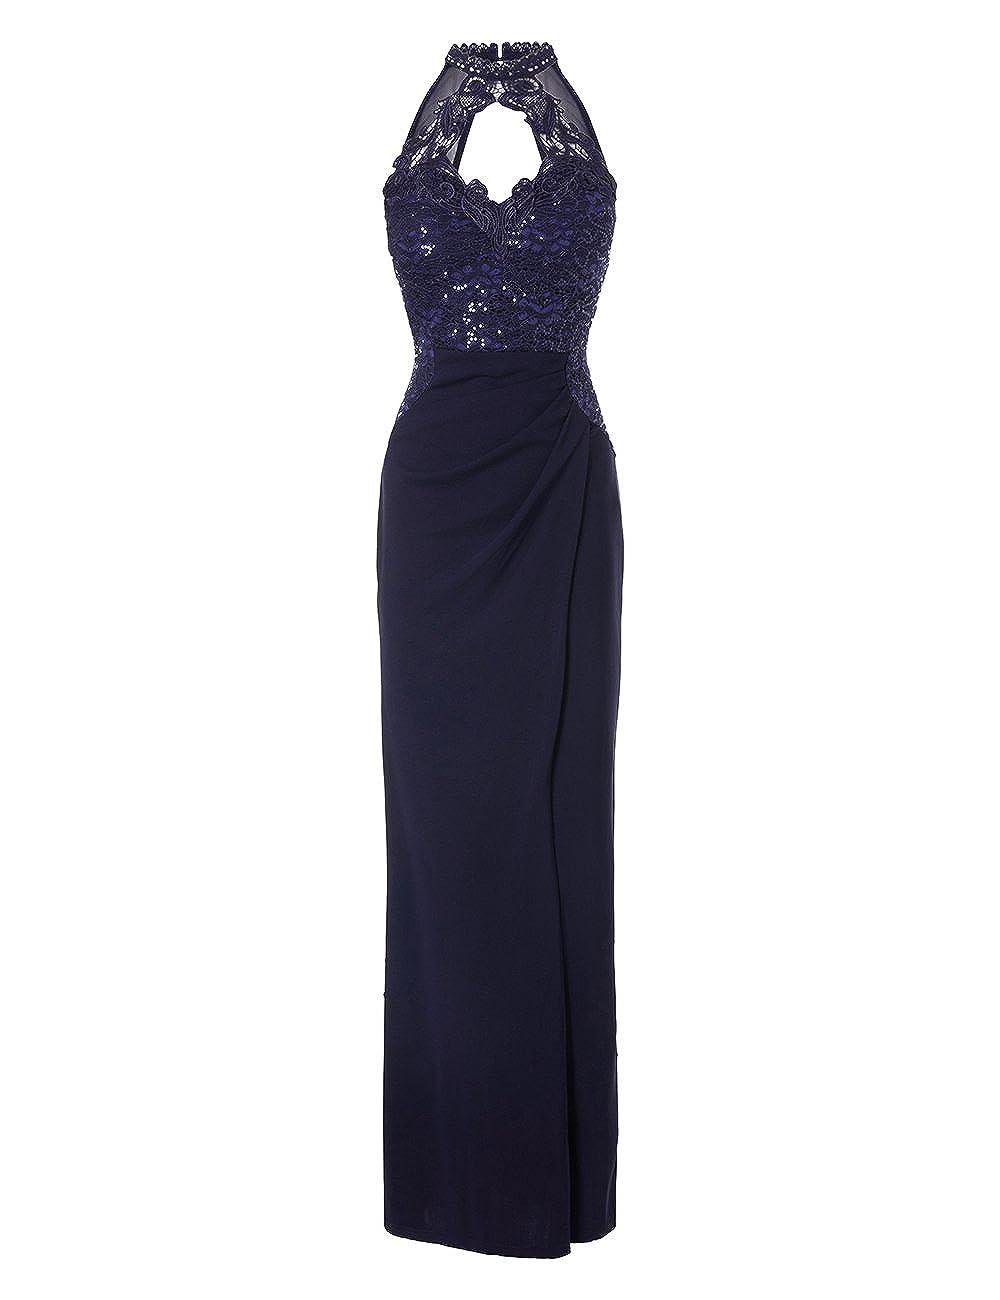 0192c2695f3d98 LIPSY Womens Sequin Bust Wrap Maxi Dress Blue US 12 (UK 16)  Amazon.ca   Clothing   Accessories